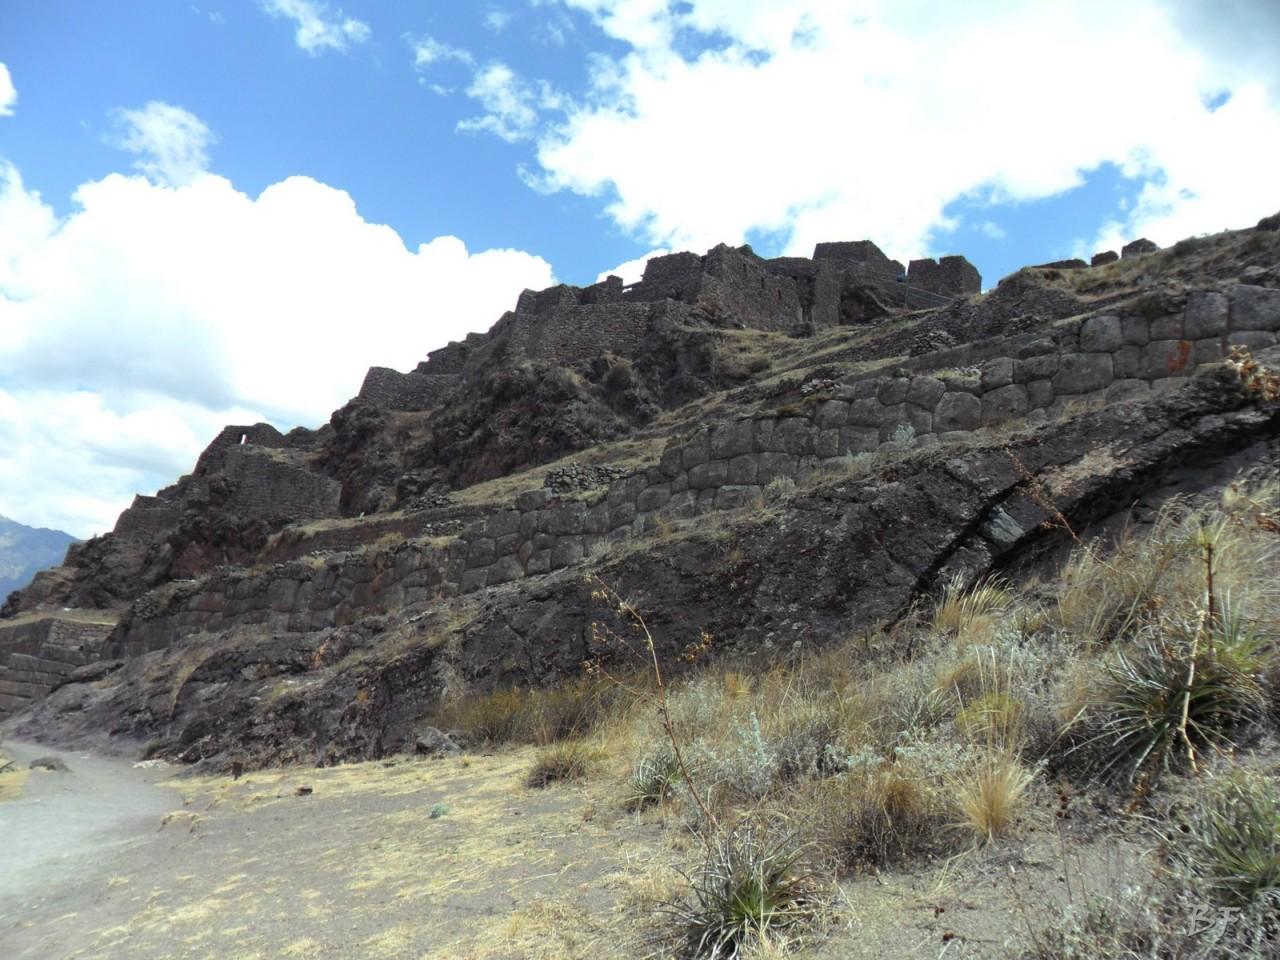 Mura-Poligonali-Megaliti-Altari-Rupestri-Pisac-Cusco-Perù-24